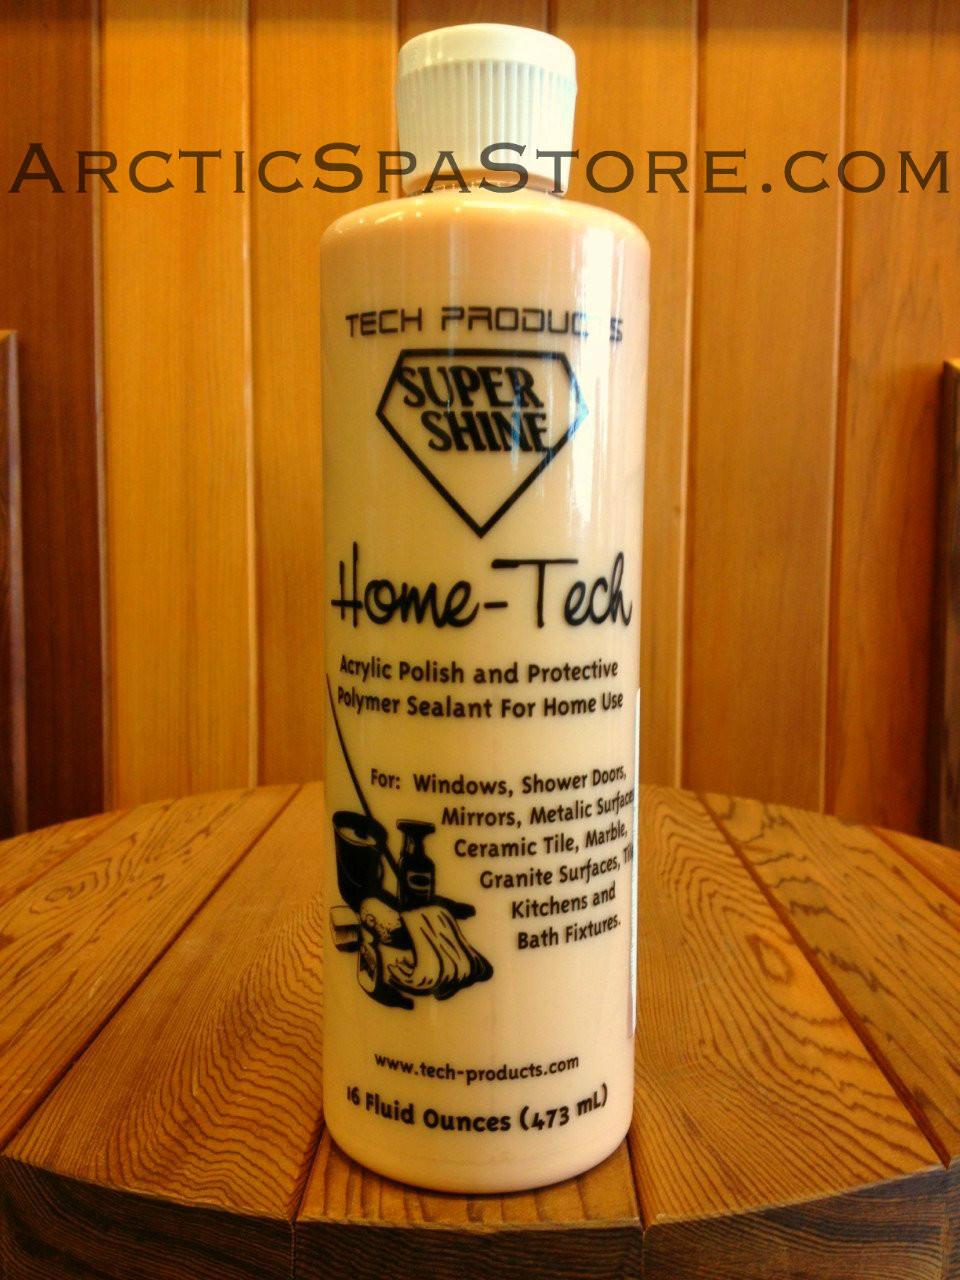 Spa polish home tech 16 oz spray bottle for Home spa brand towels